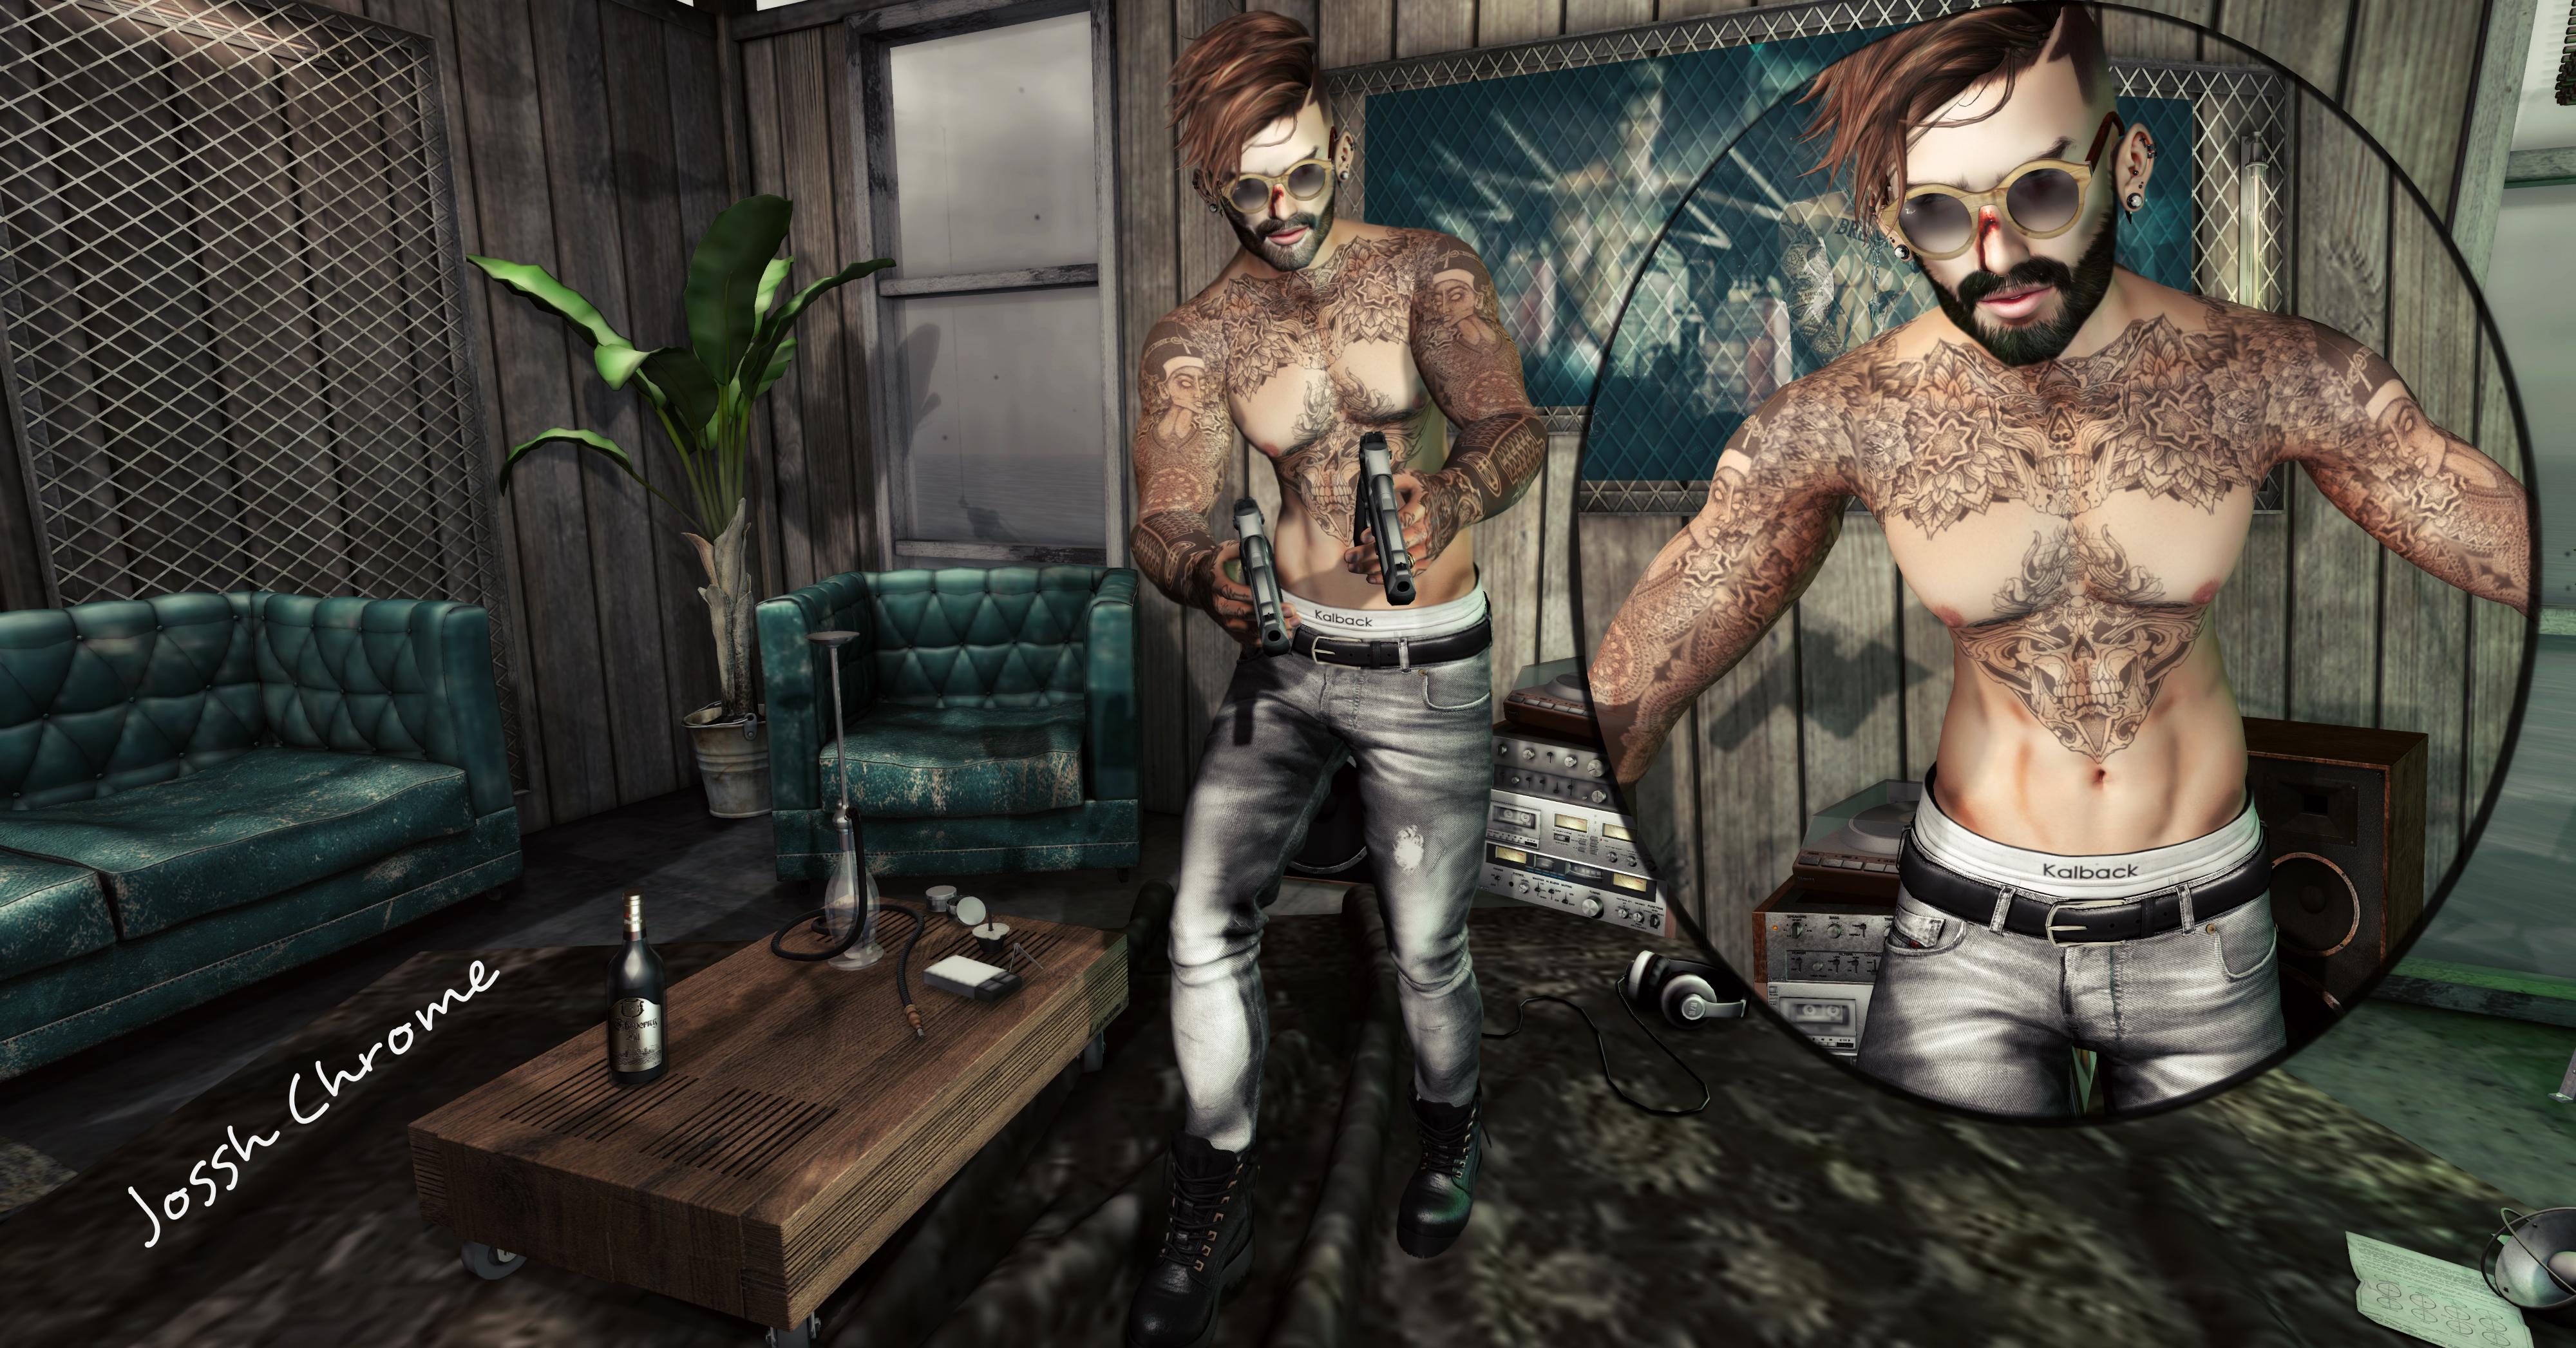 Wallpaper : street, urban, tattoo, pants, hair, Avatar, life